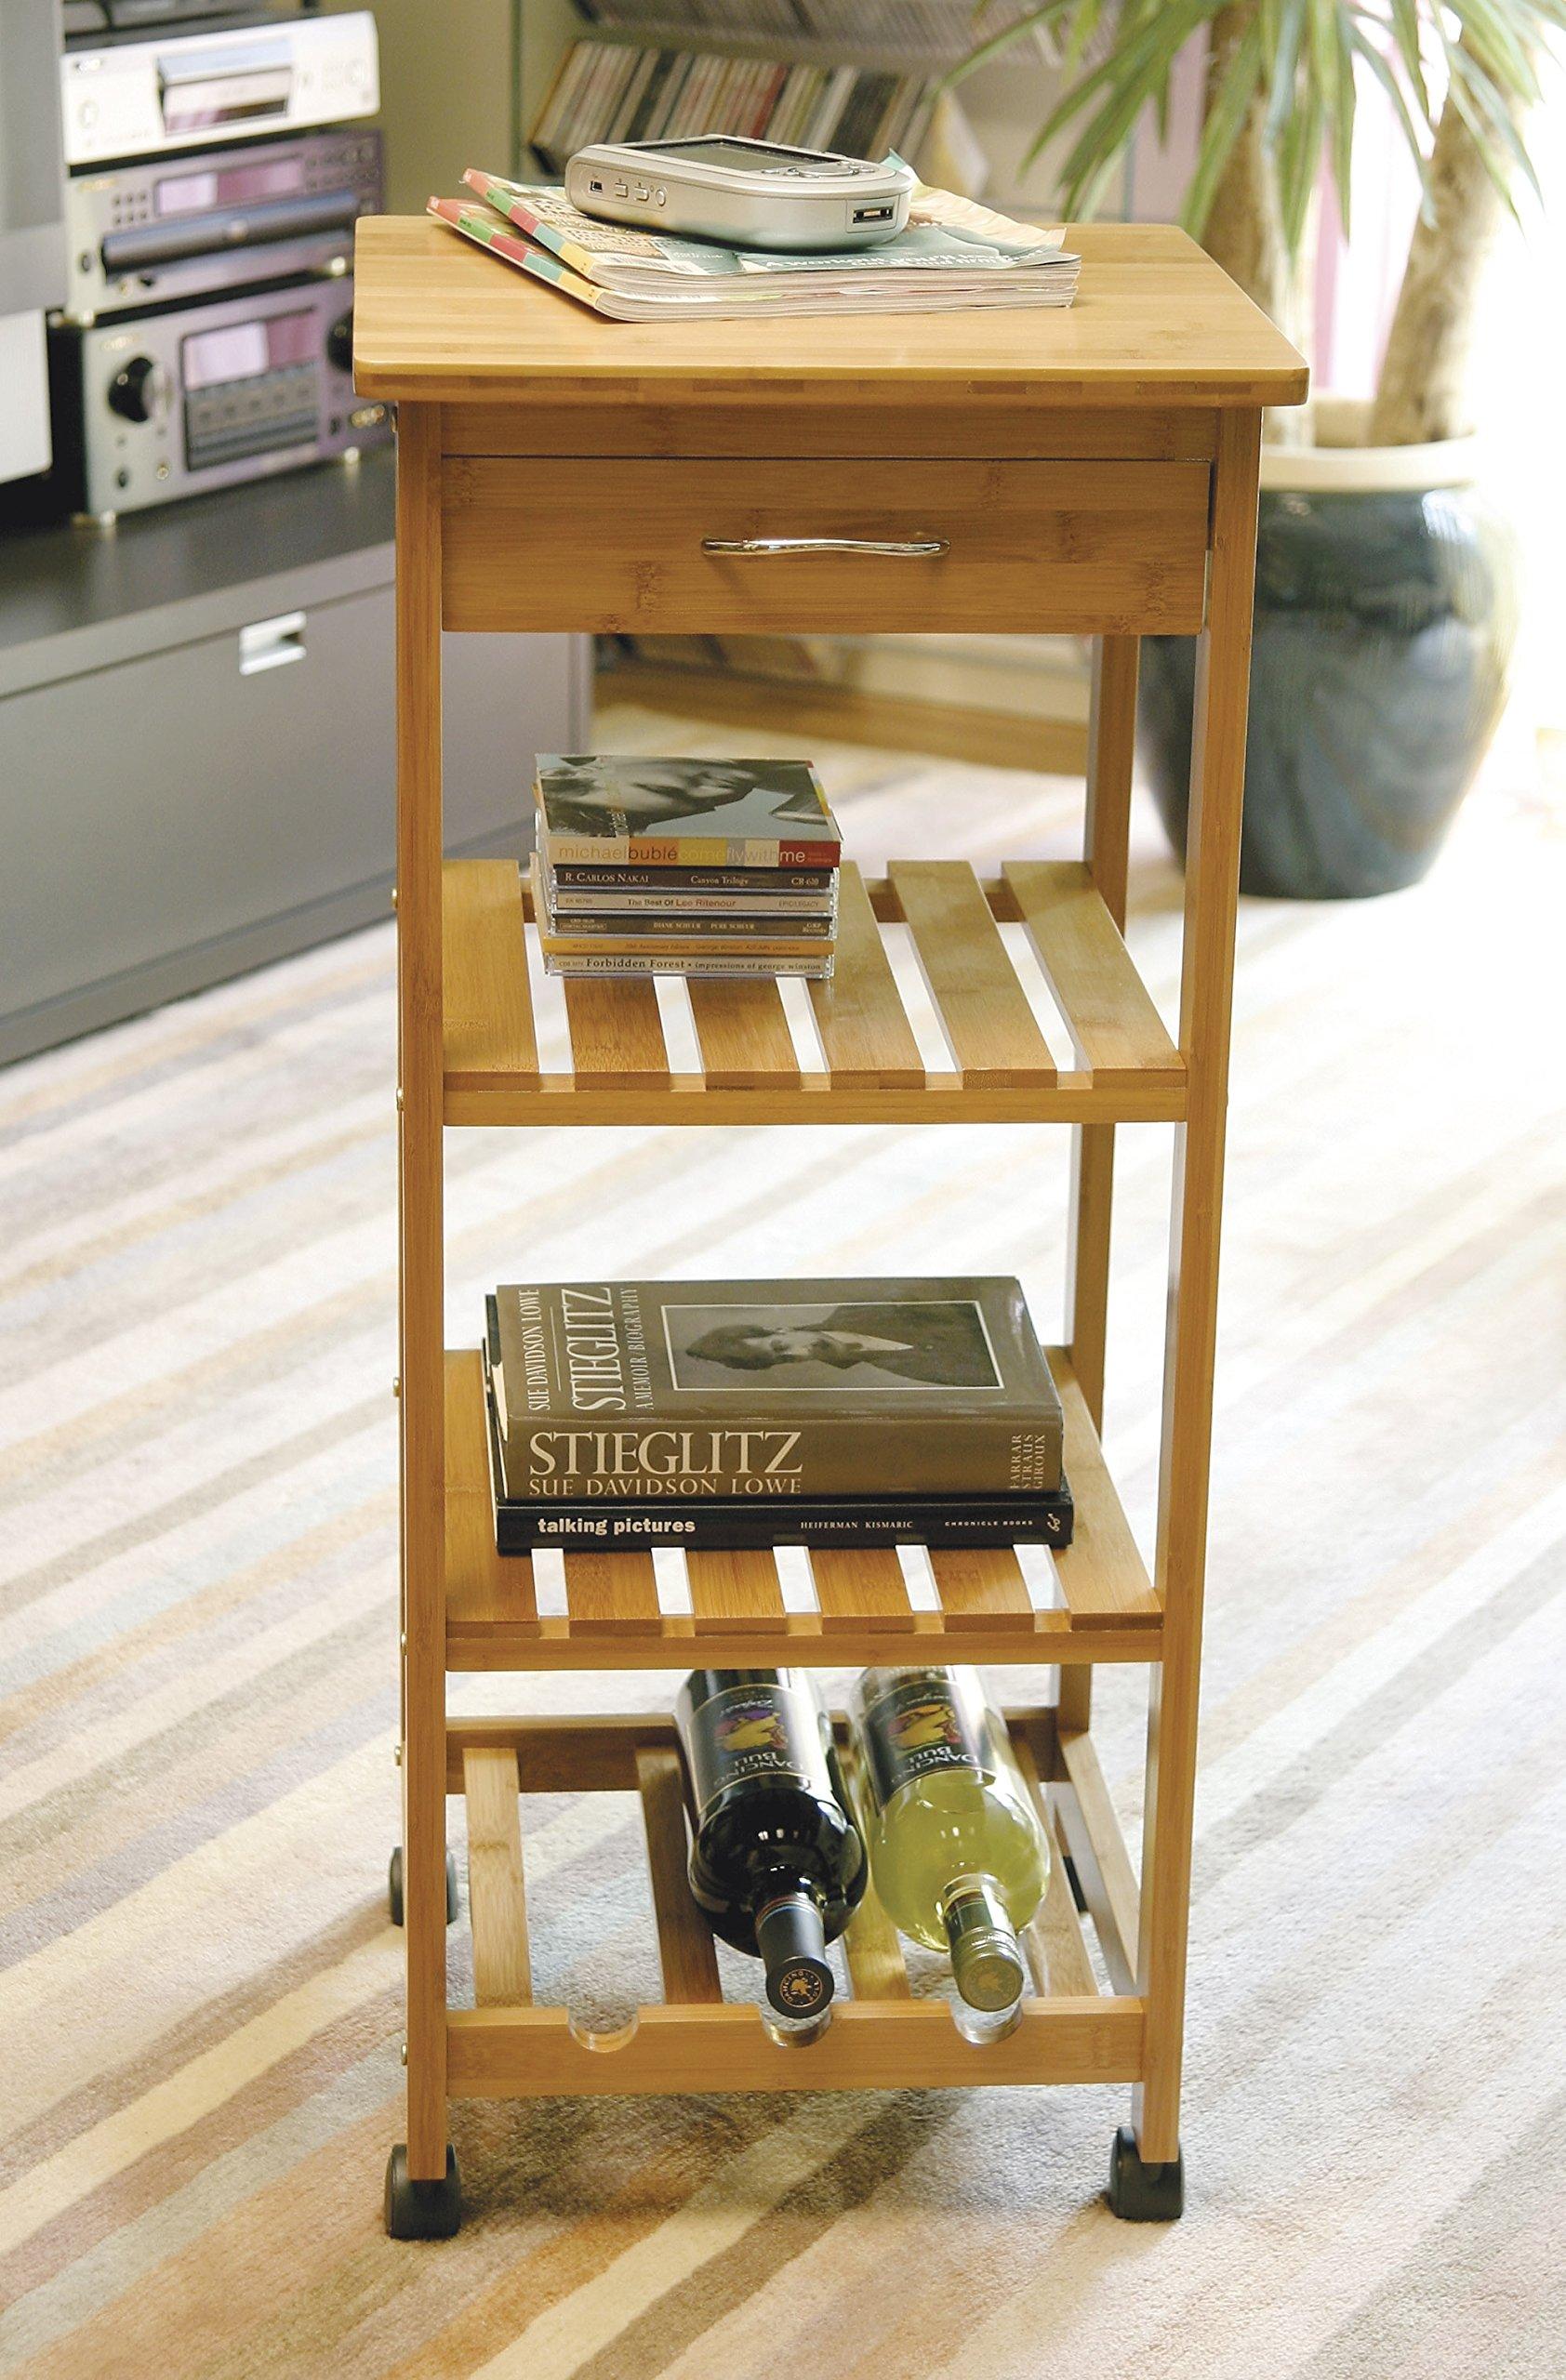 Lipper International 8914 Bamboo Wood Space-Saving Cart with 1 Drawer, 14.5'' x 14.5'' x 33.5'' by Lipper International (Image #4)